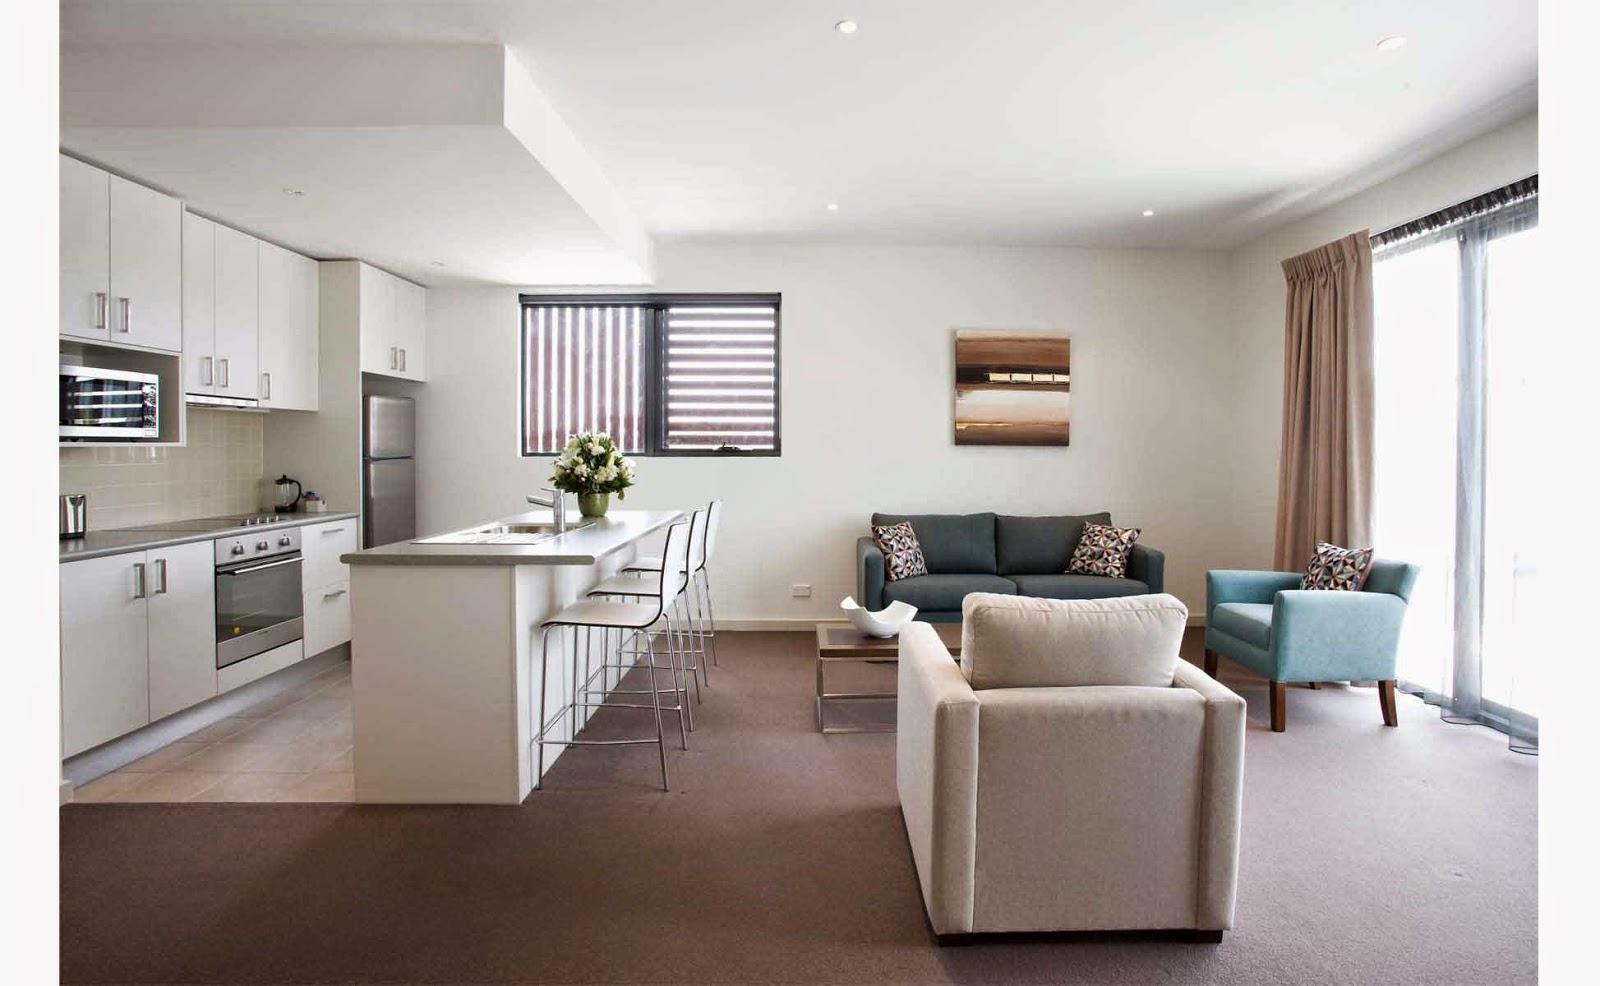 Affordable Interior Design Boston Small Apartment U0026 Decorating Ideas